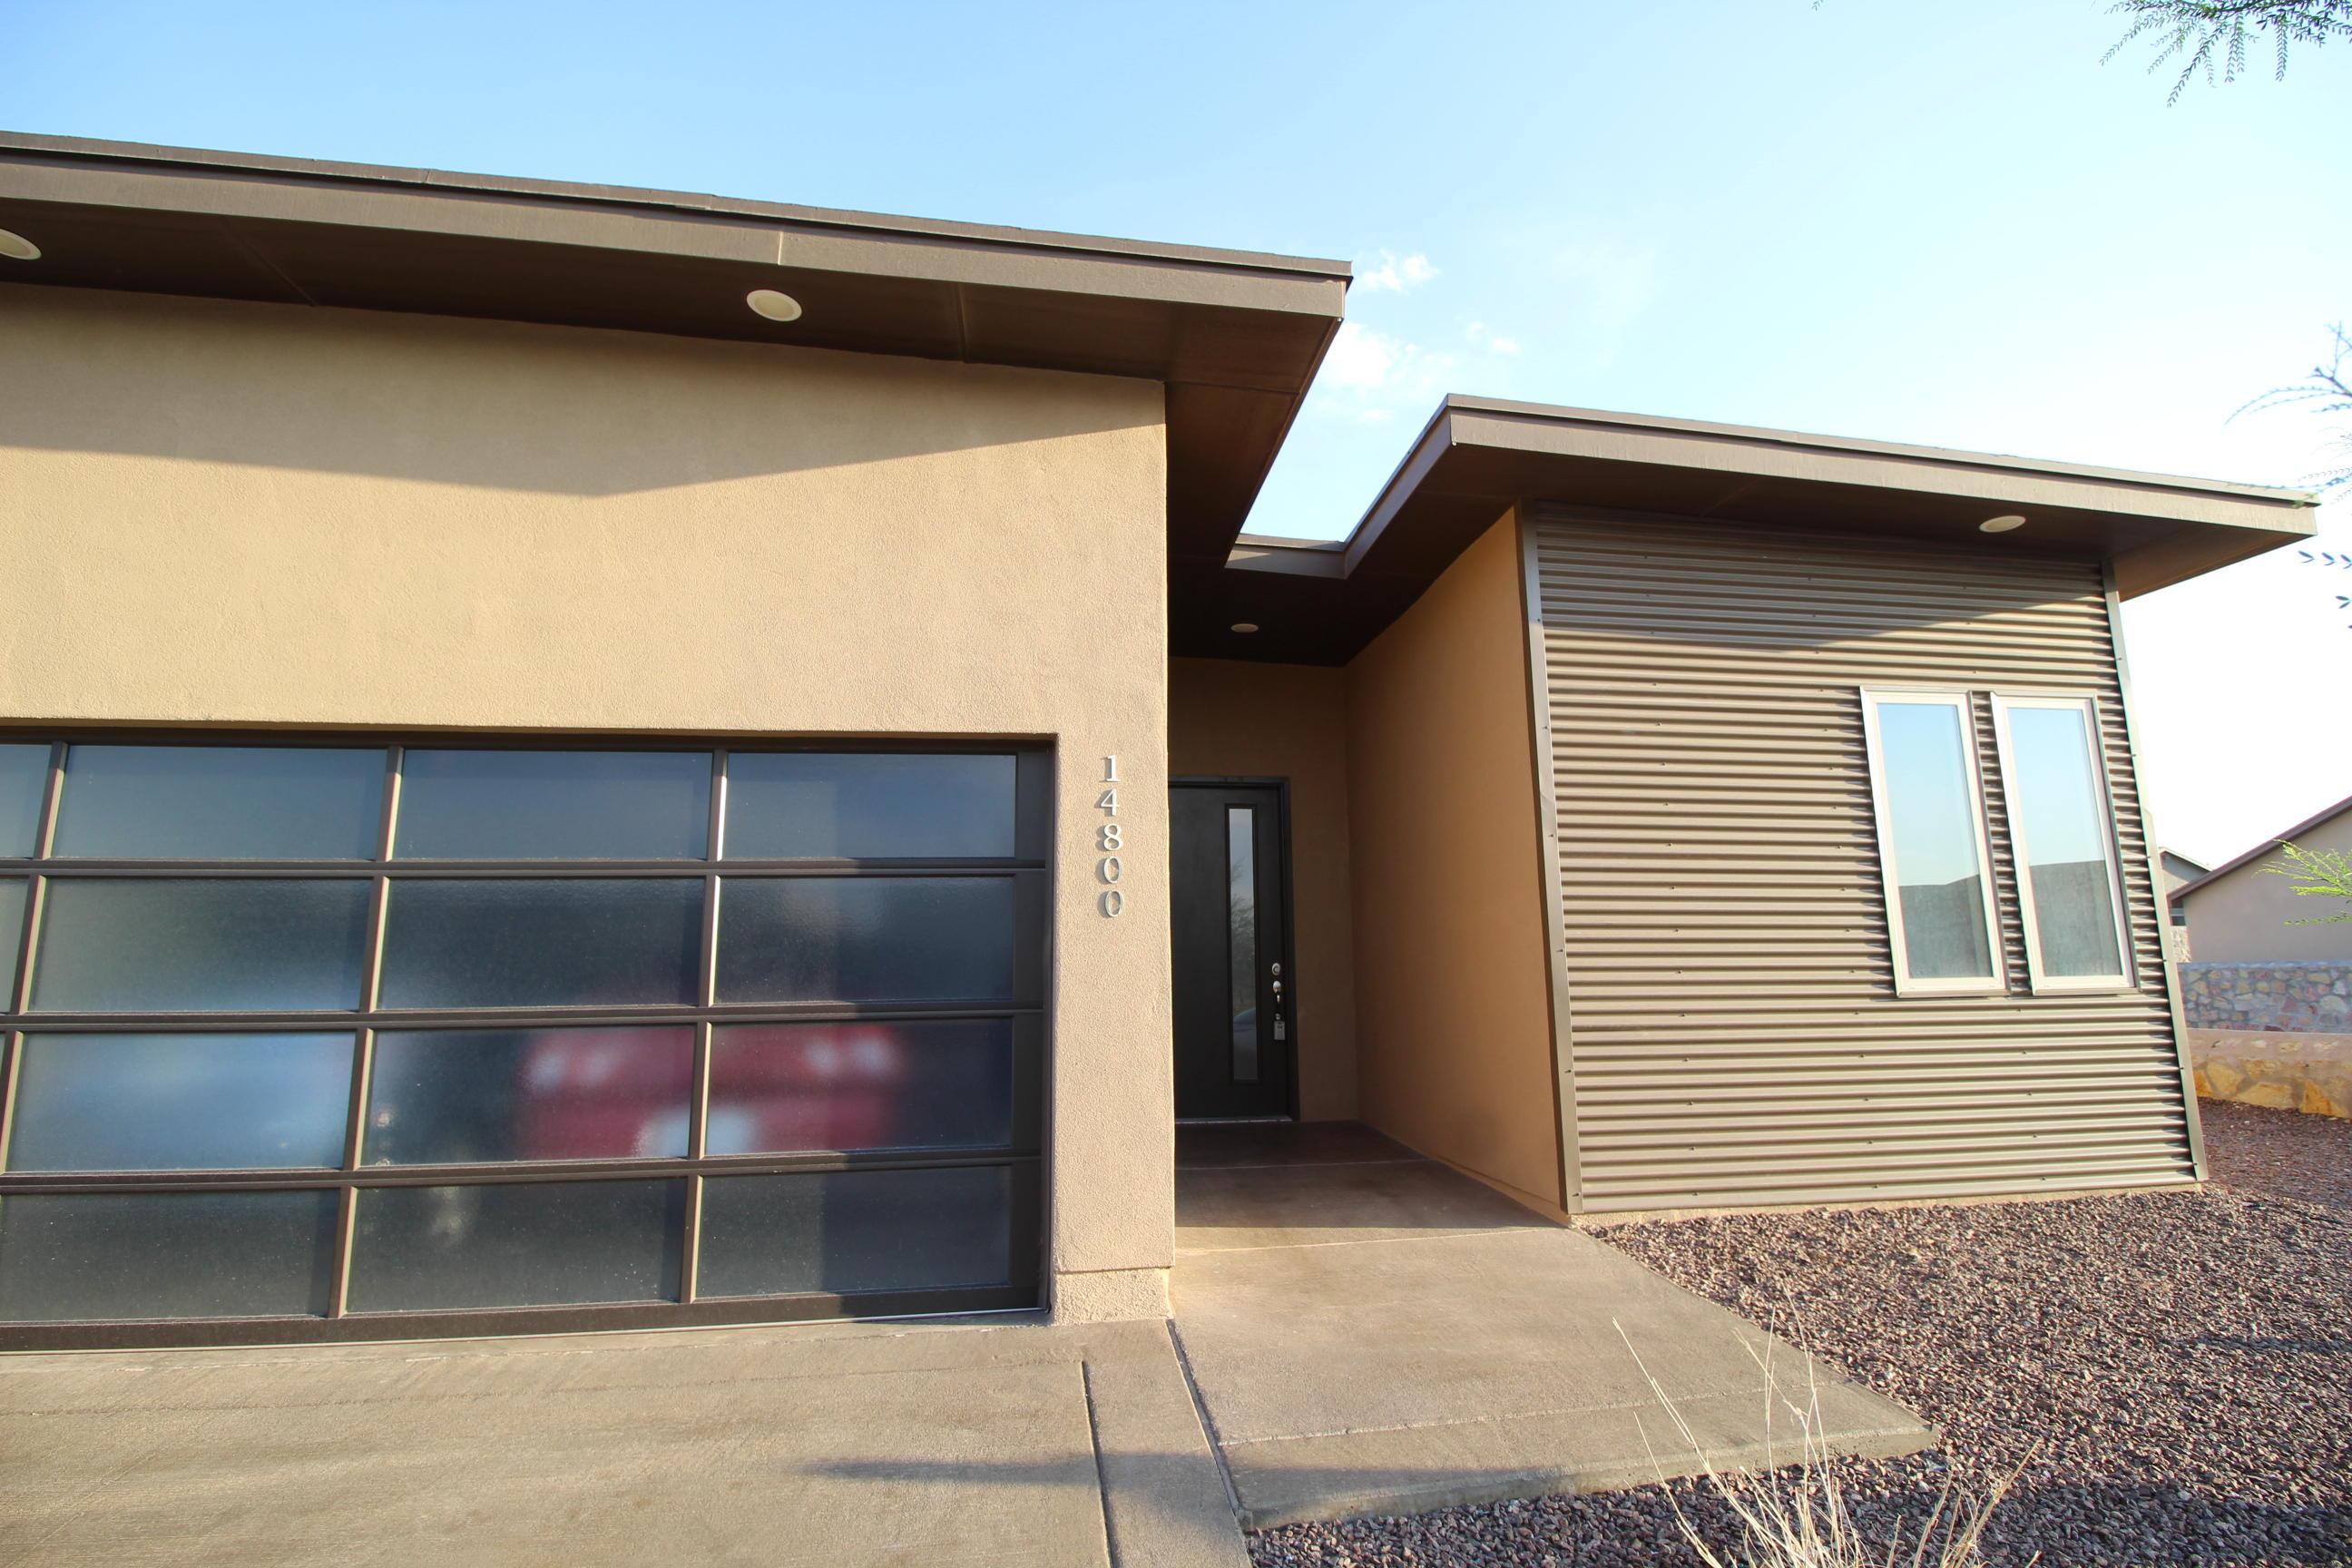 14800 HARRY FLOURNOY, El Paso, Texas 79938, 3 Bedrooms Bedrooms, ,2 BathroomsBathrooms,Residential Rental,For Rent,HARRY FLOURNOY,814285